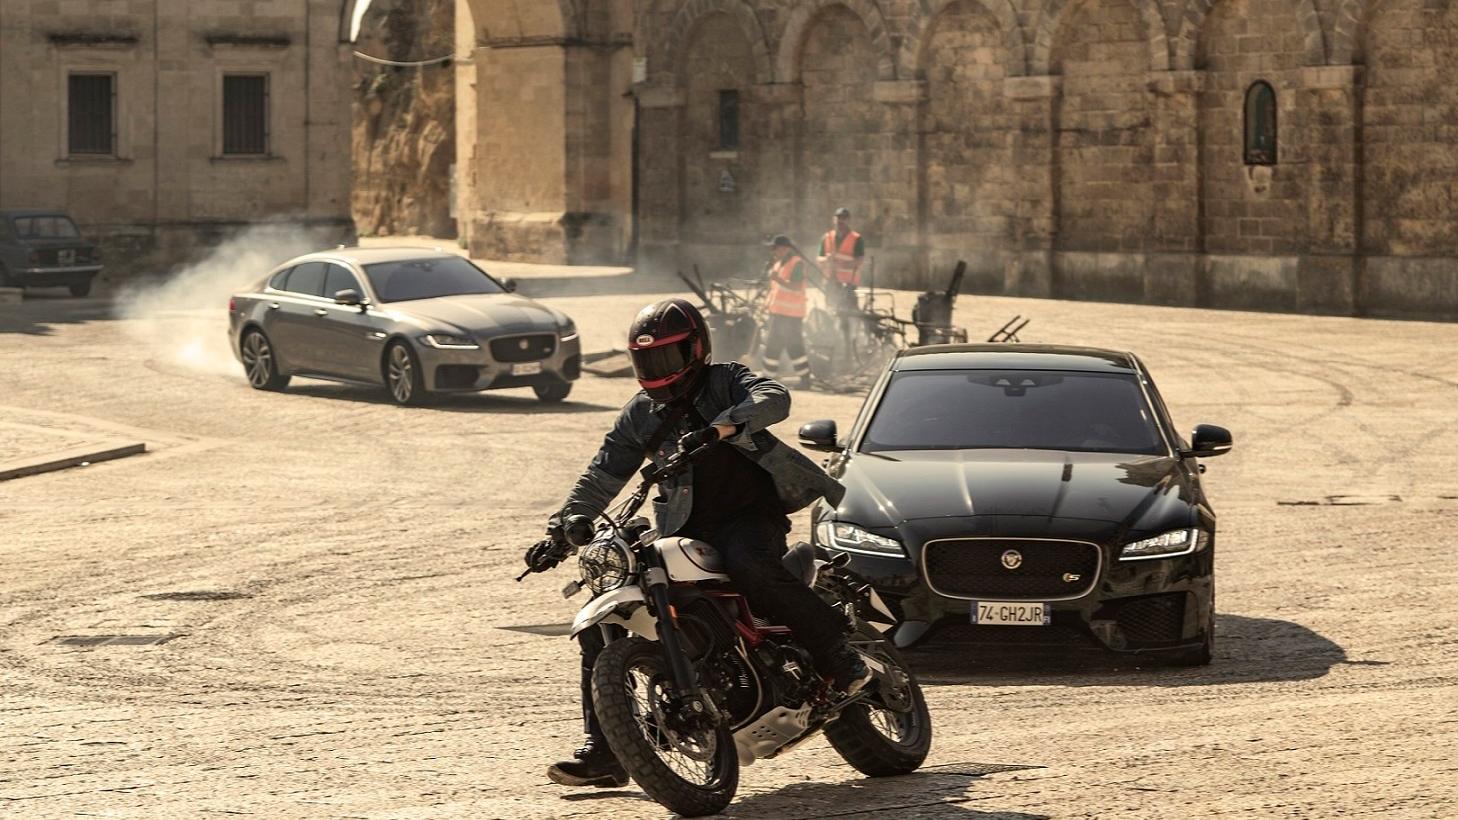 Jaguar XF 007